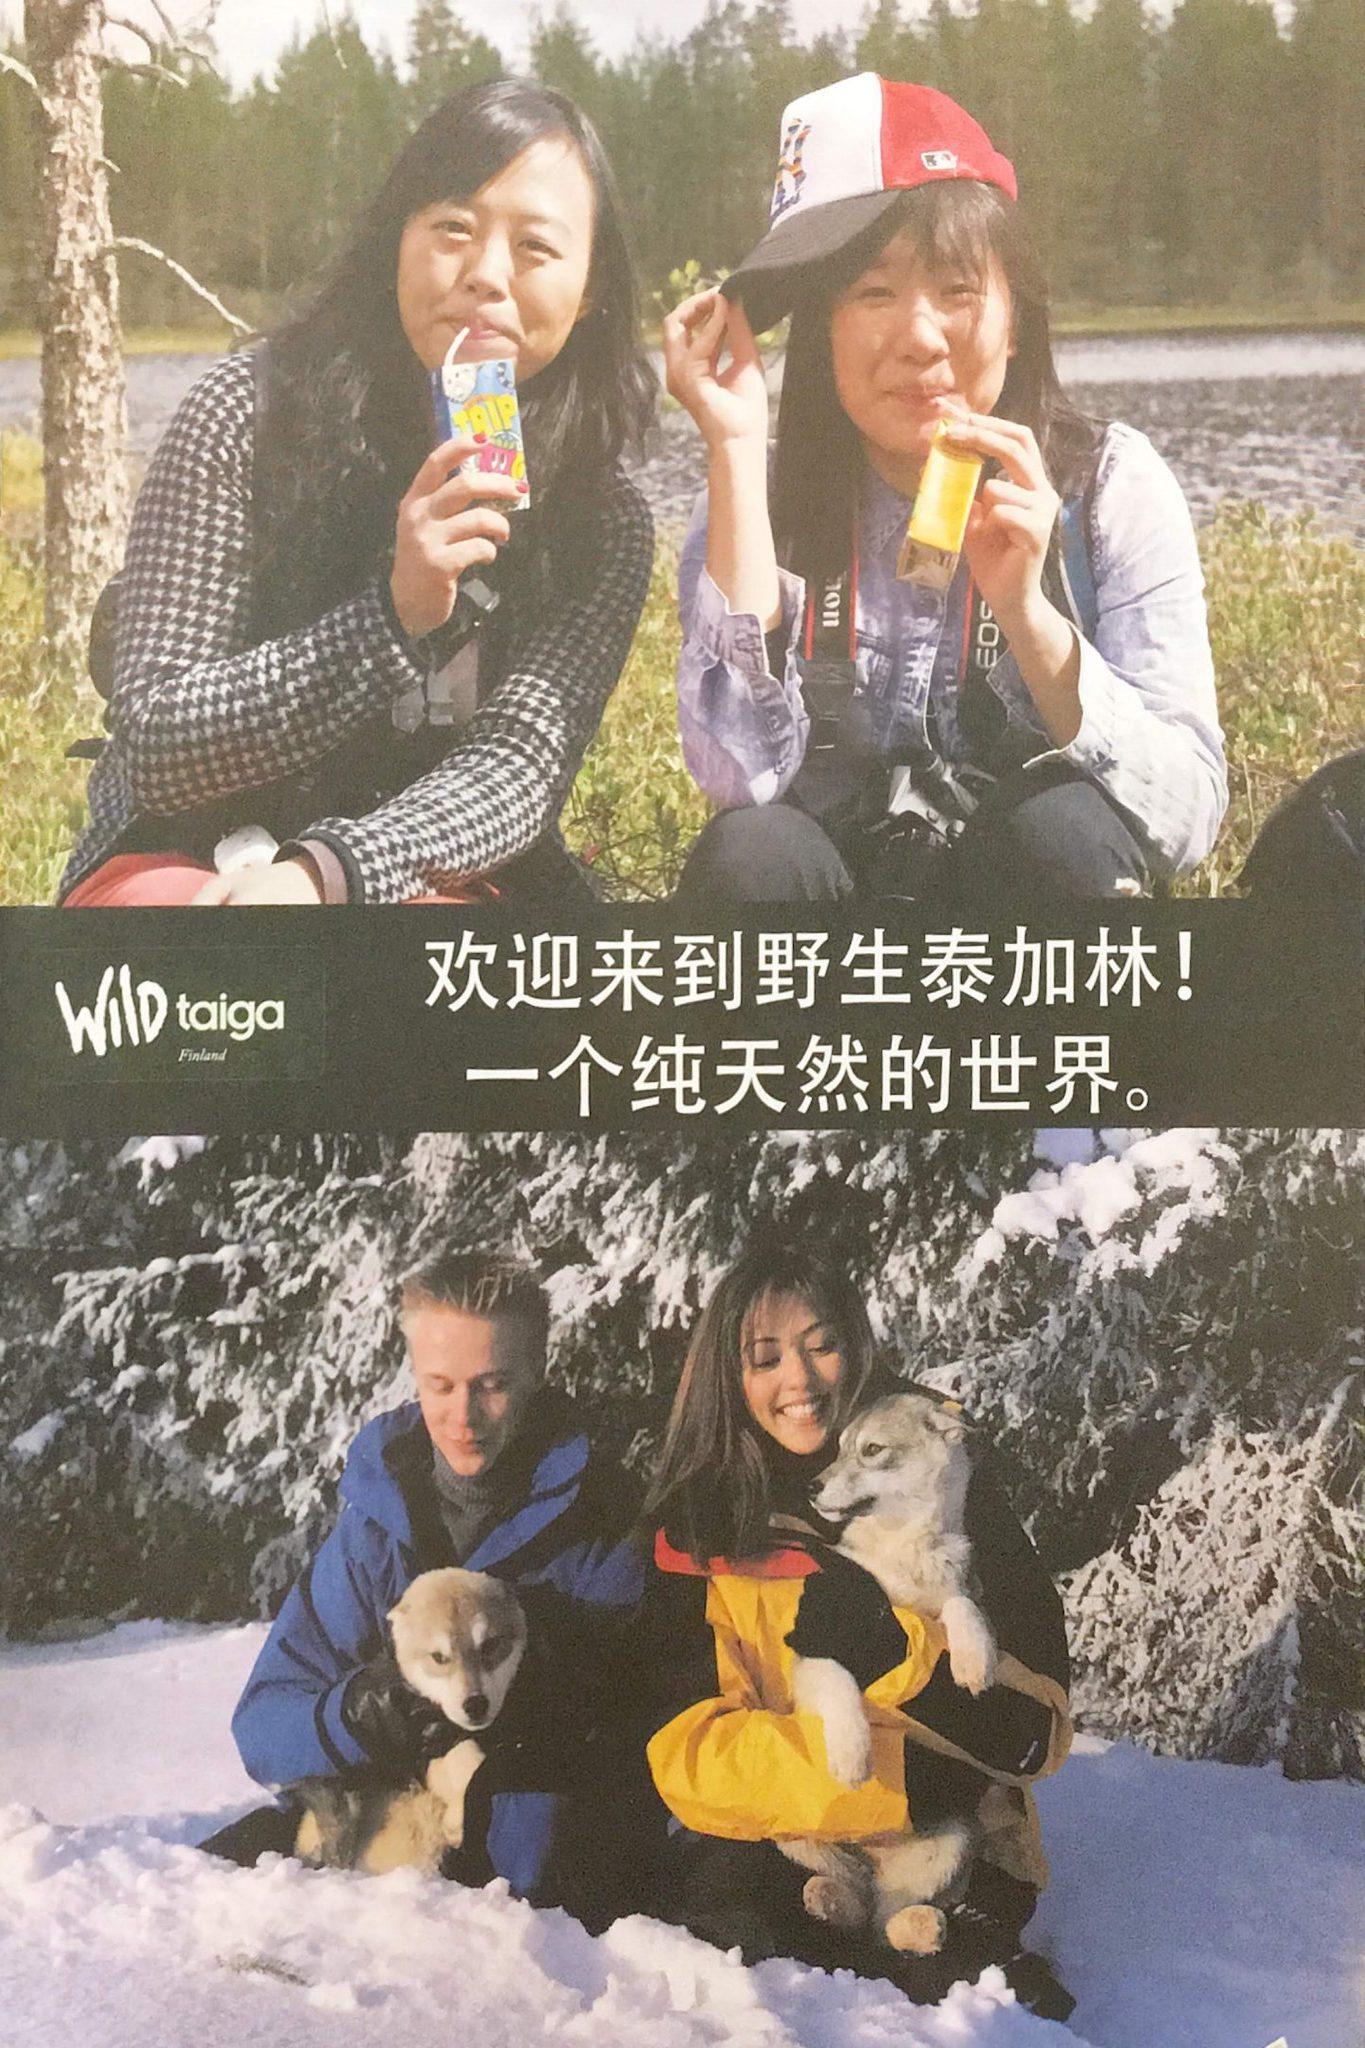 tekway-company-leaflets-brochures-taiga-e1585129499850-1443x2048